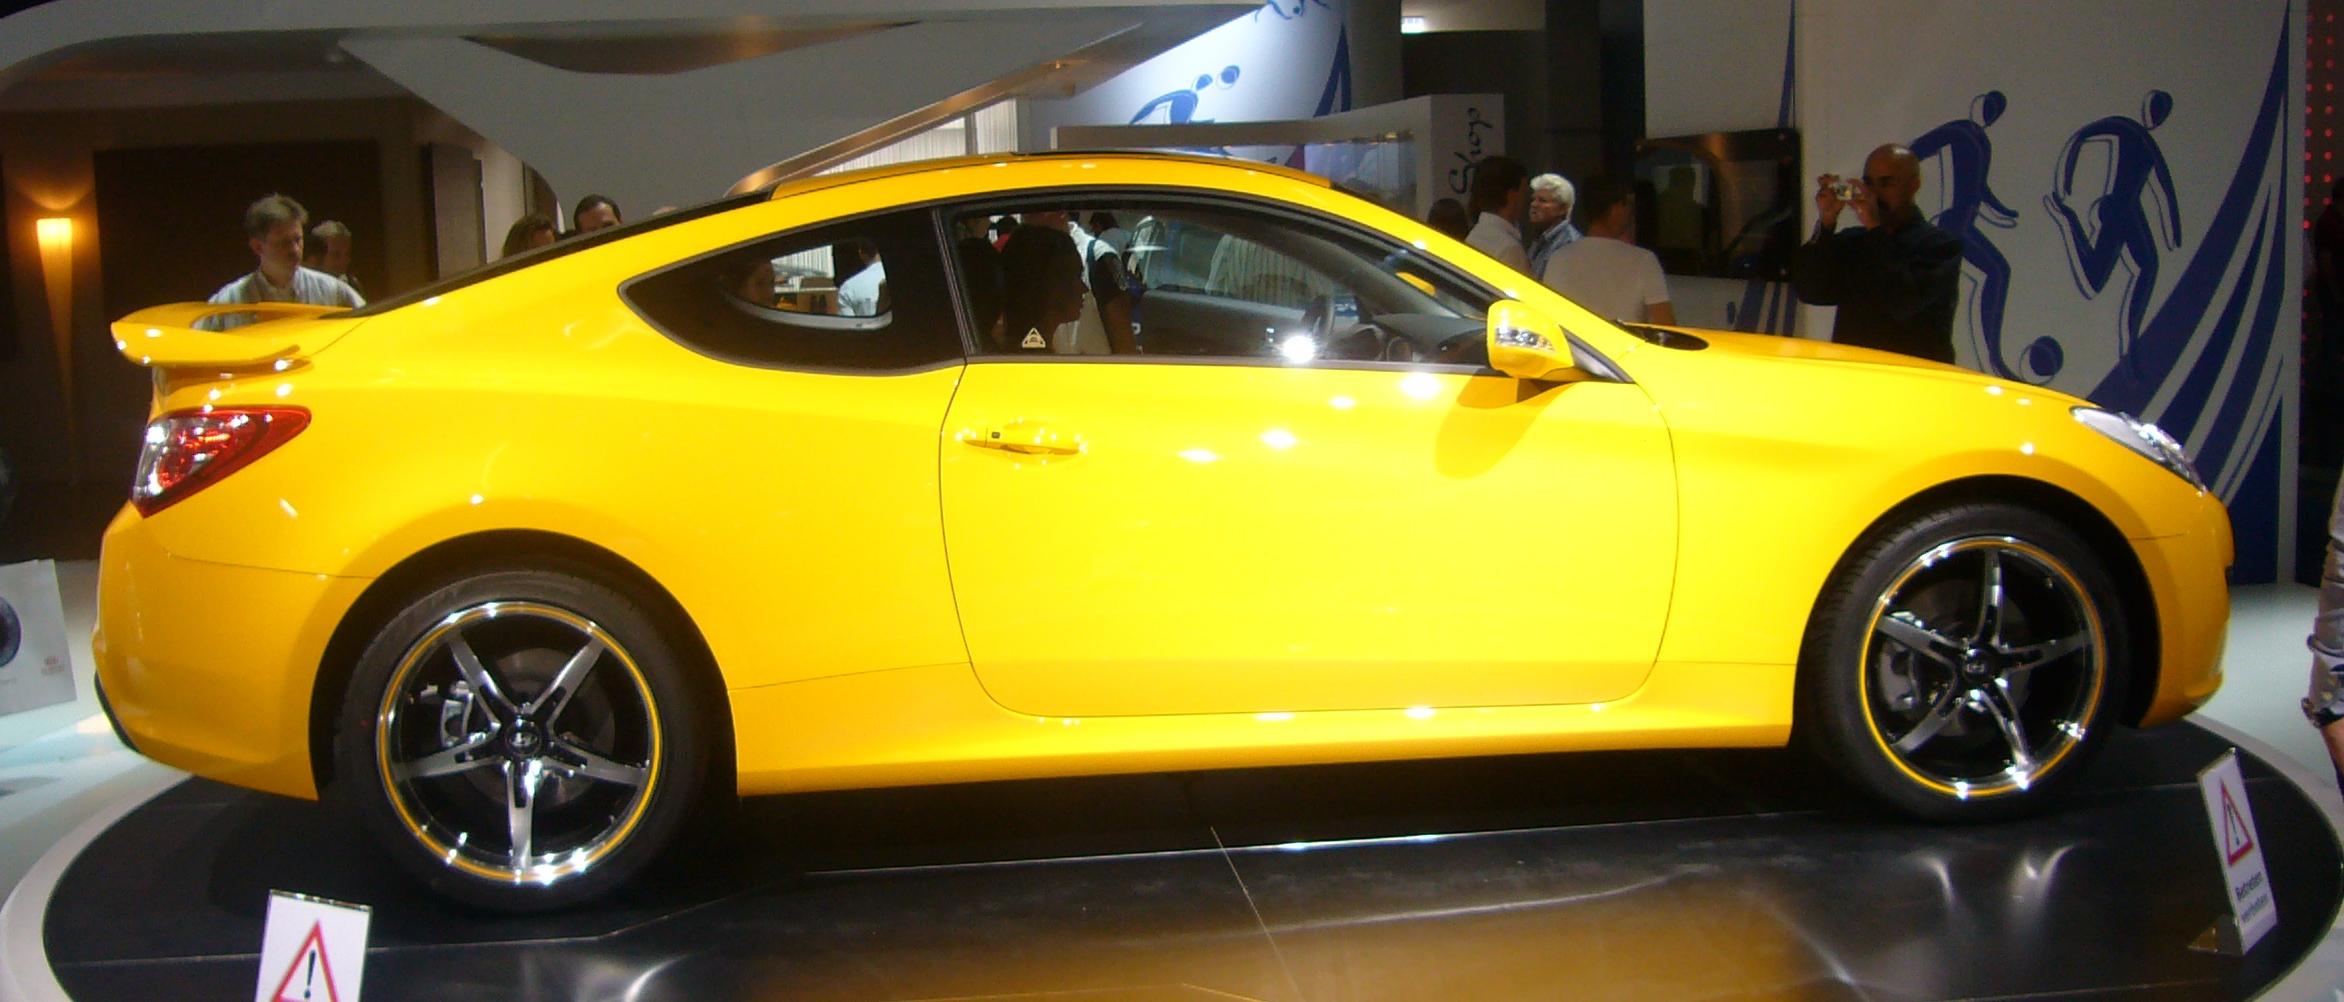 File:Hyundai Genesis Coupe (side).jpg - Wikimedia Commons